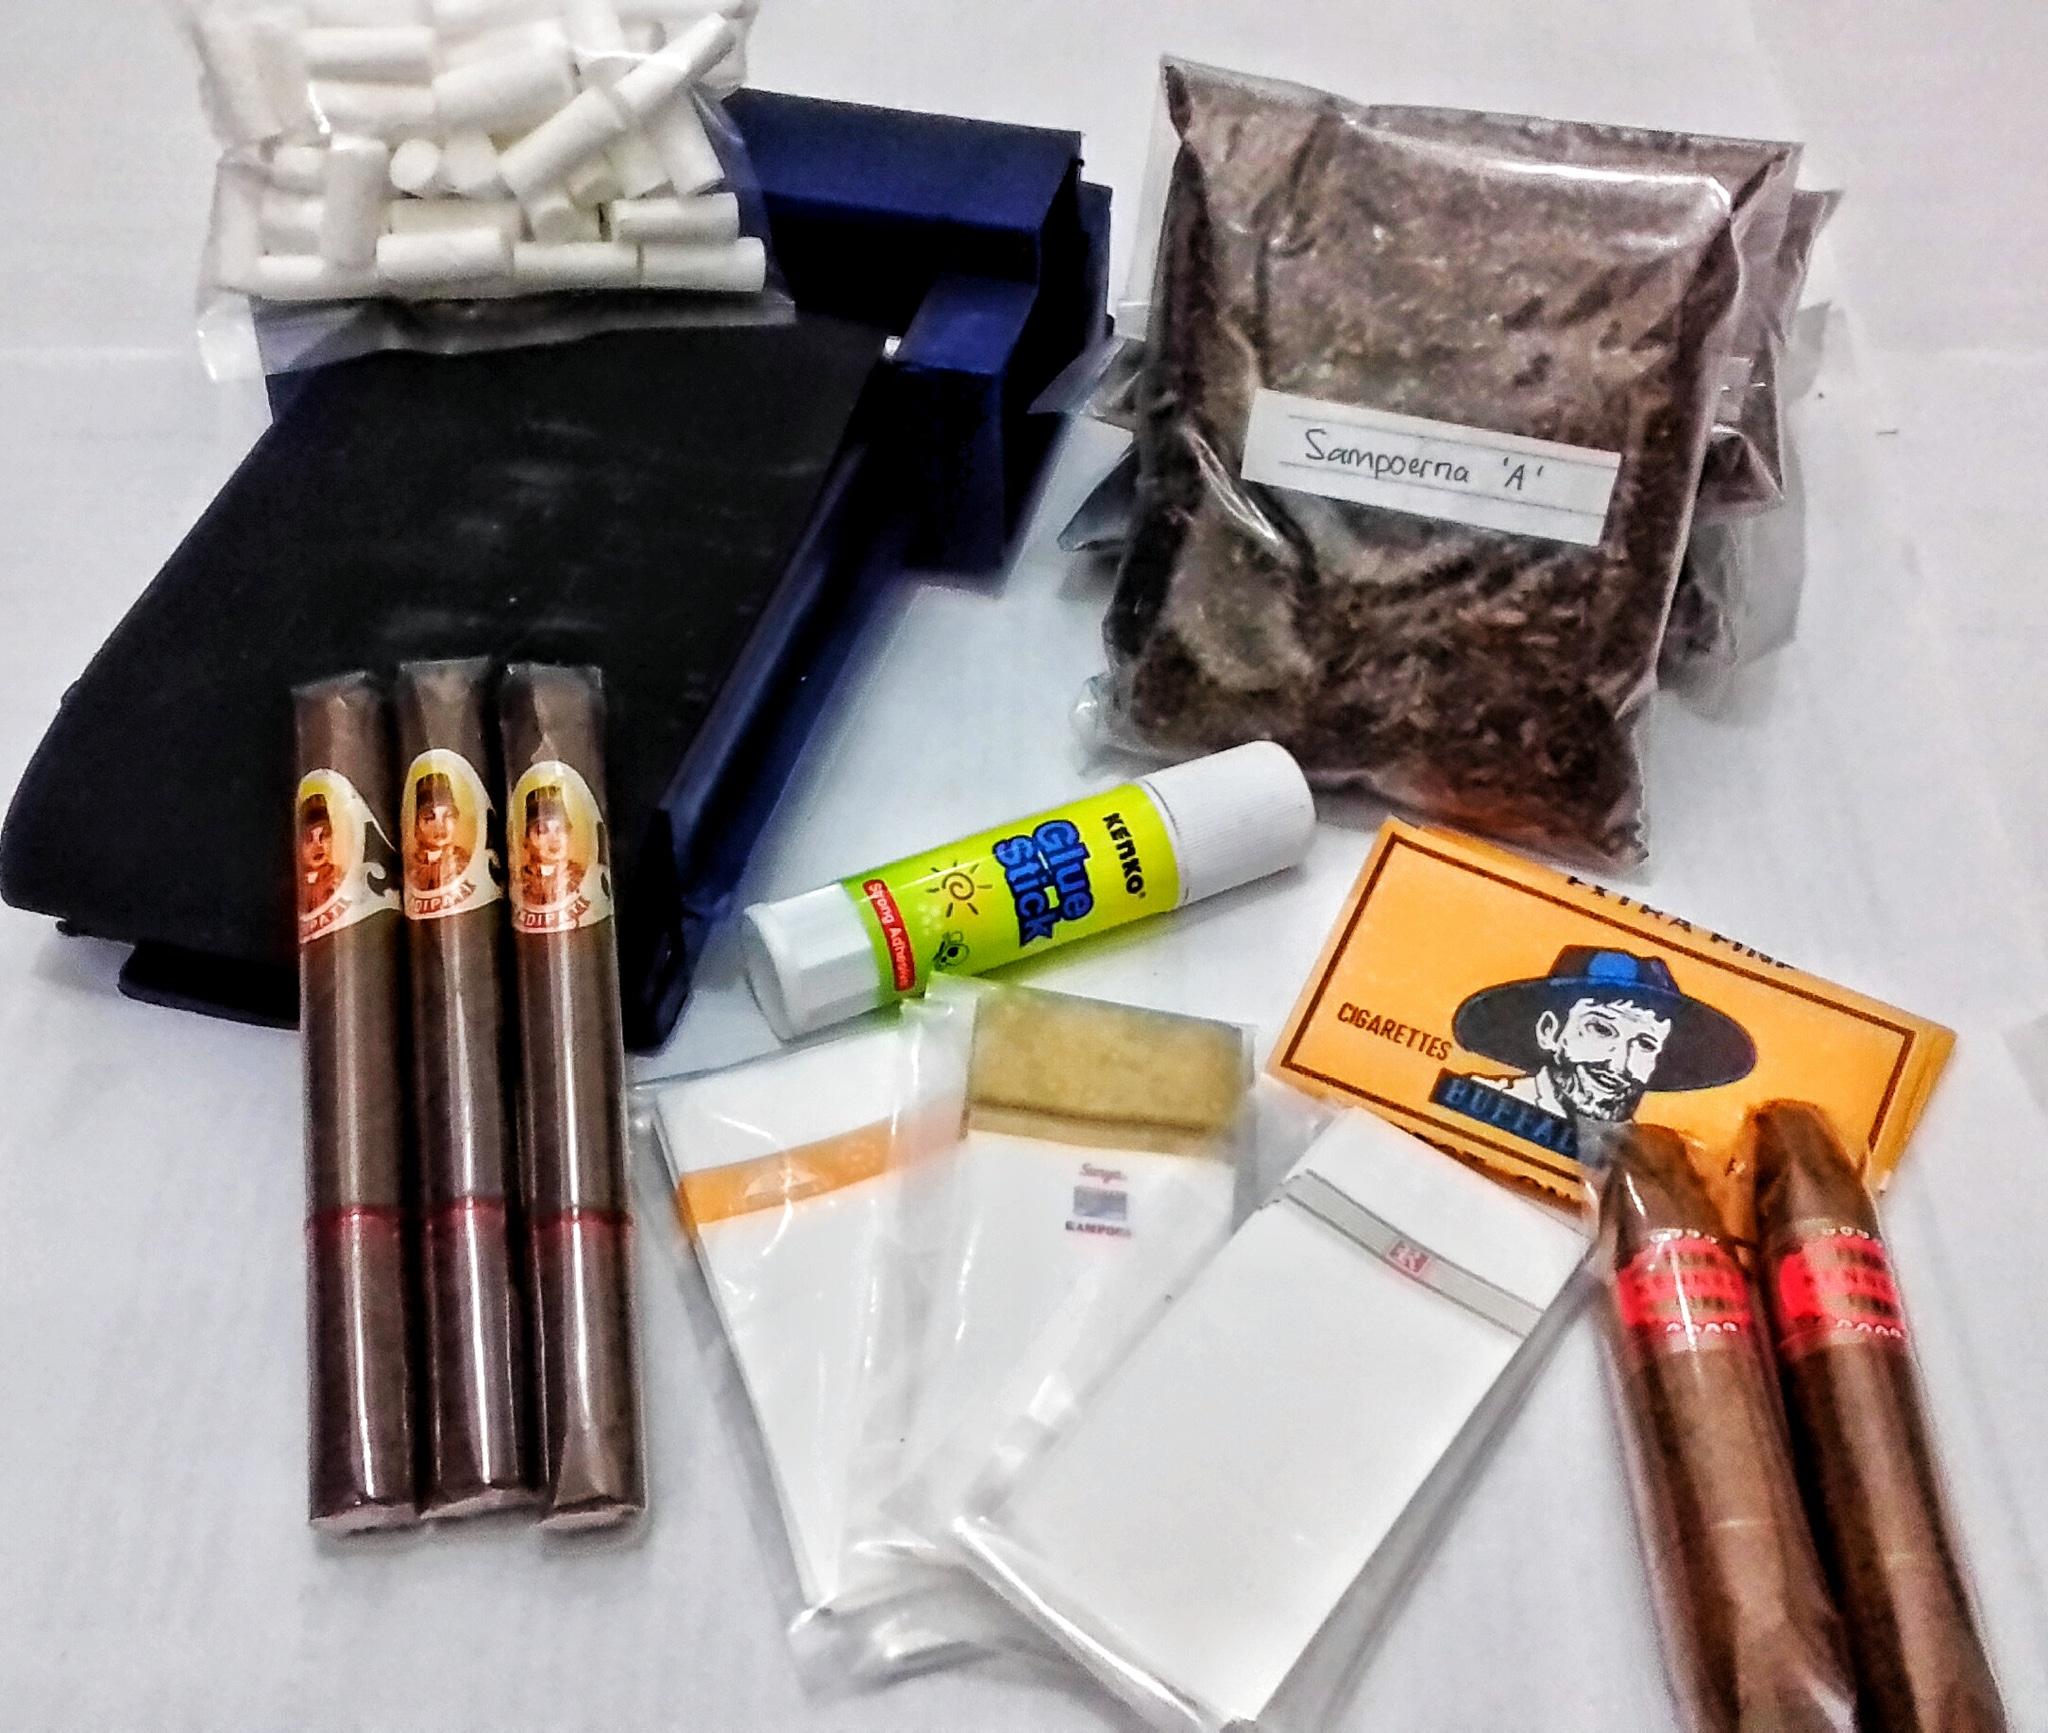 Jual Paket Alat Linting Rokok Besar Cerutu Lokal Cigar Tobacco Atau Mesin Tokopedia